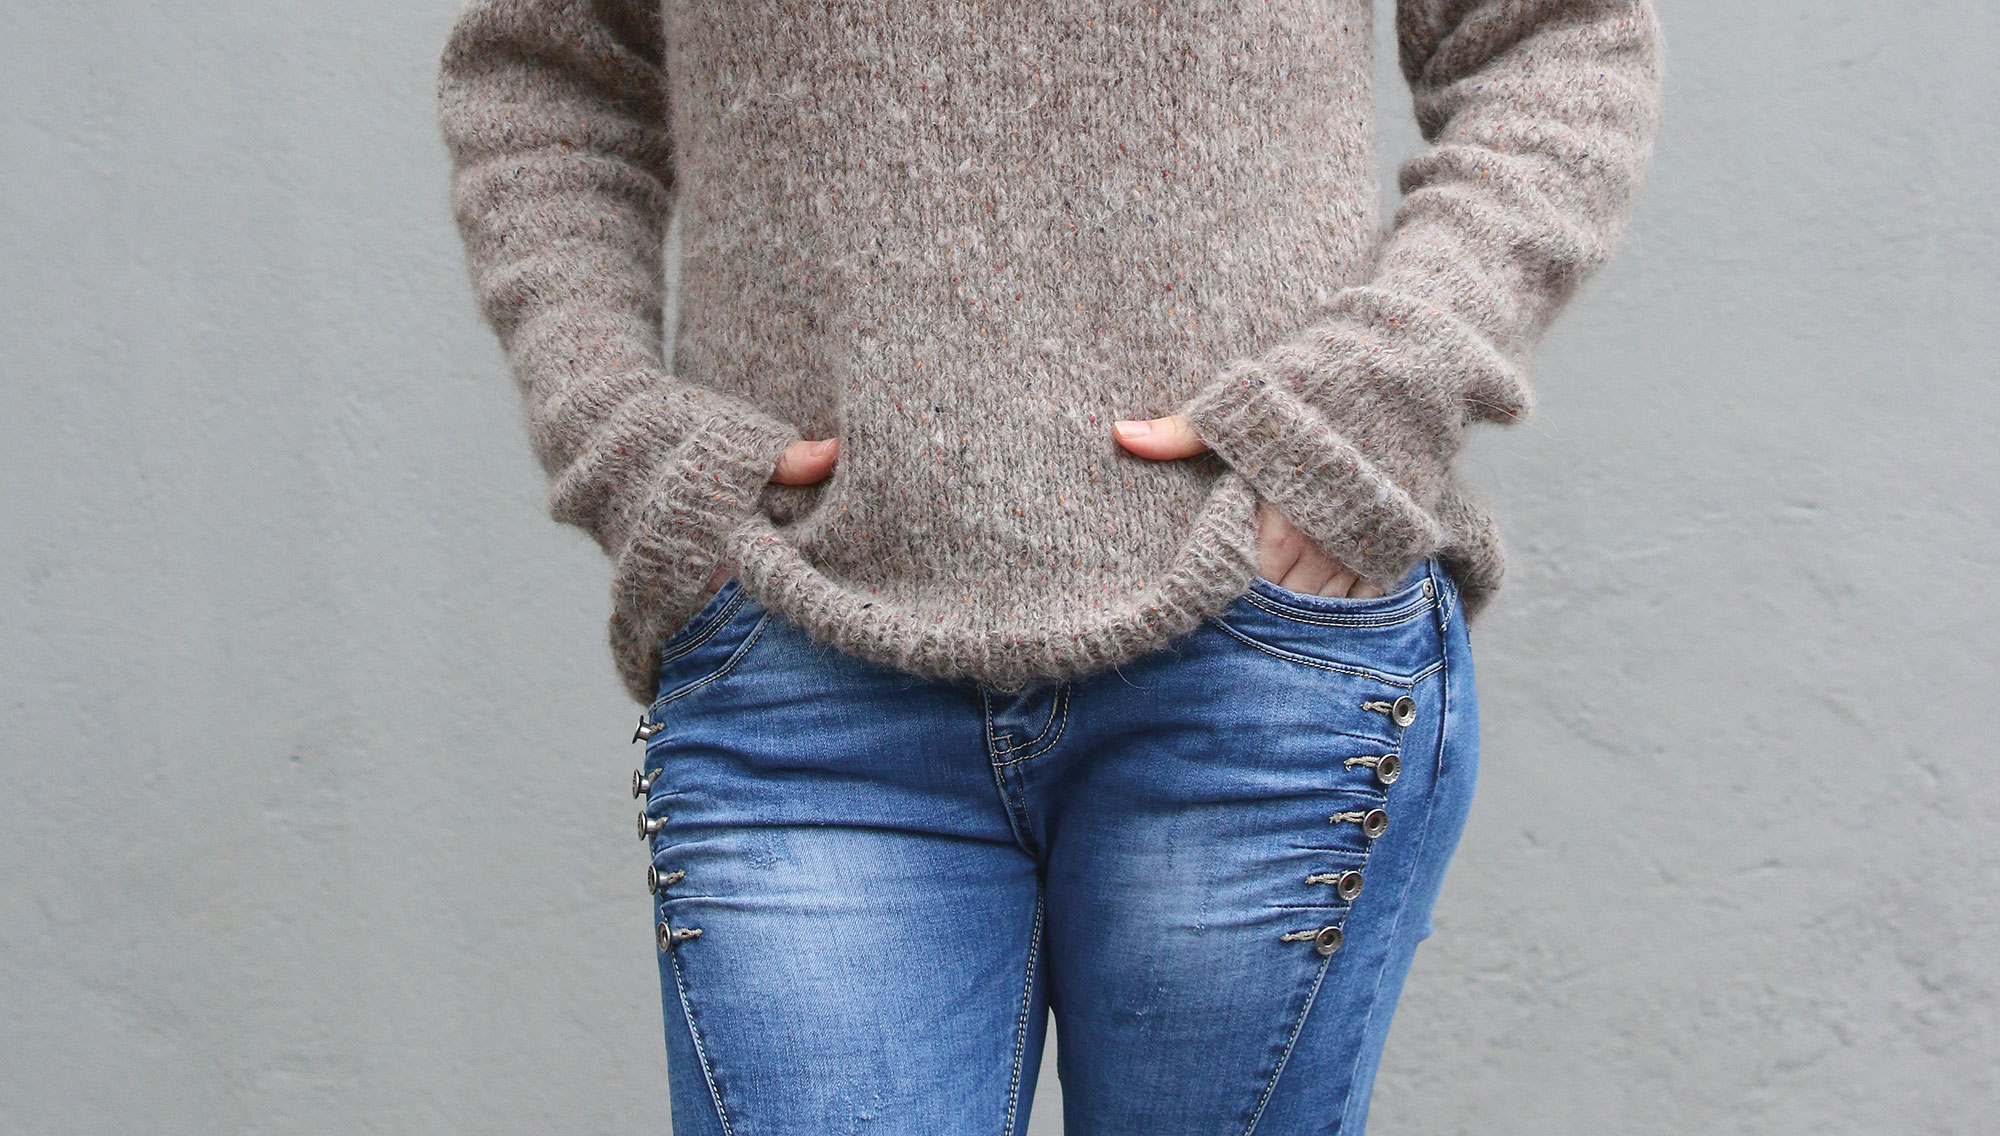 Älskade tweed!